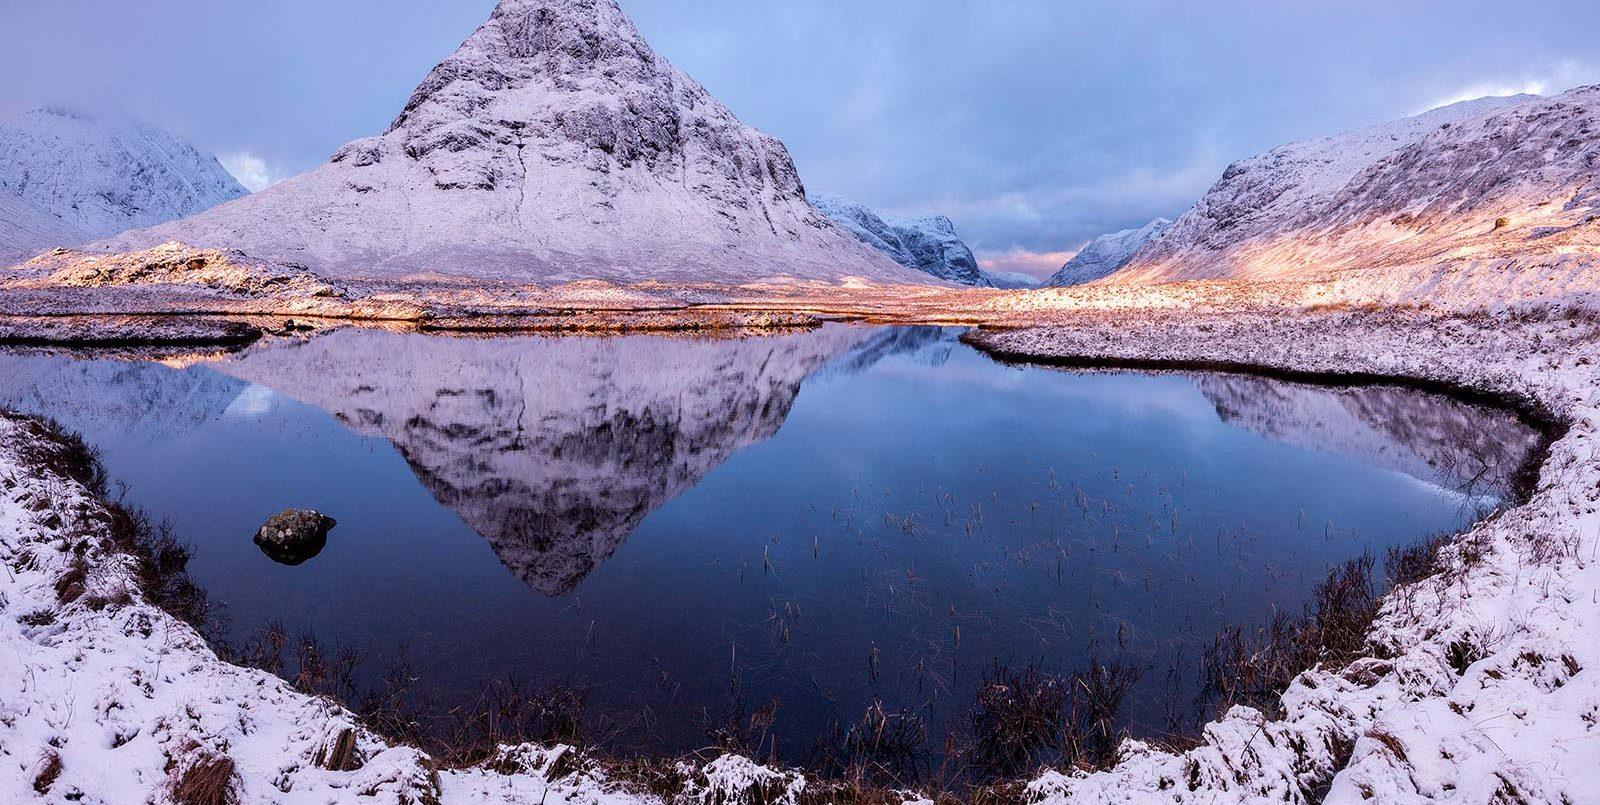 sharper landscape photos